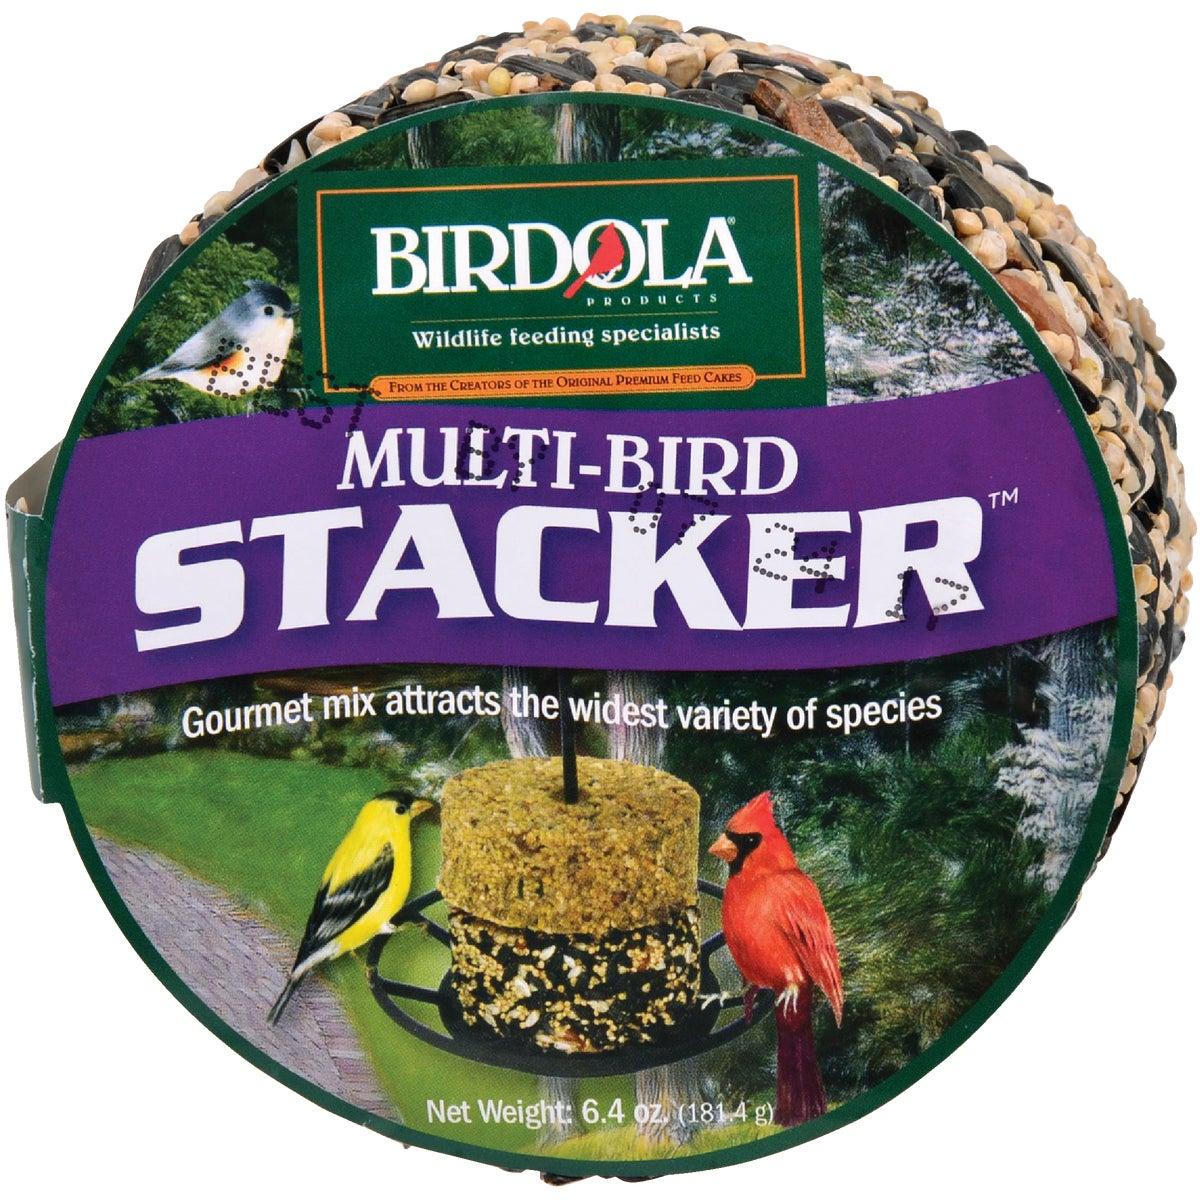 MULTI-BIRD STACKER CAKE - 54610 by United Pet Group